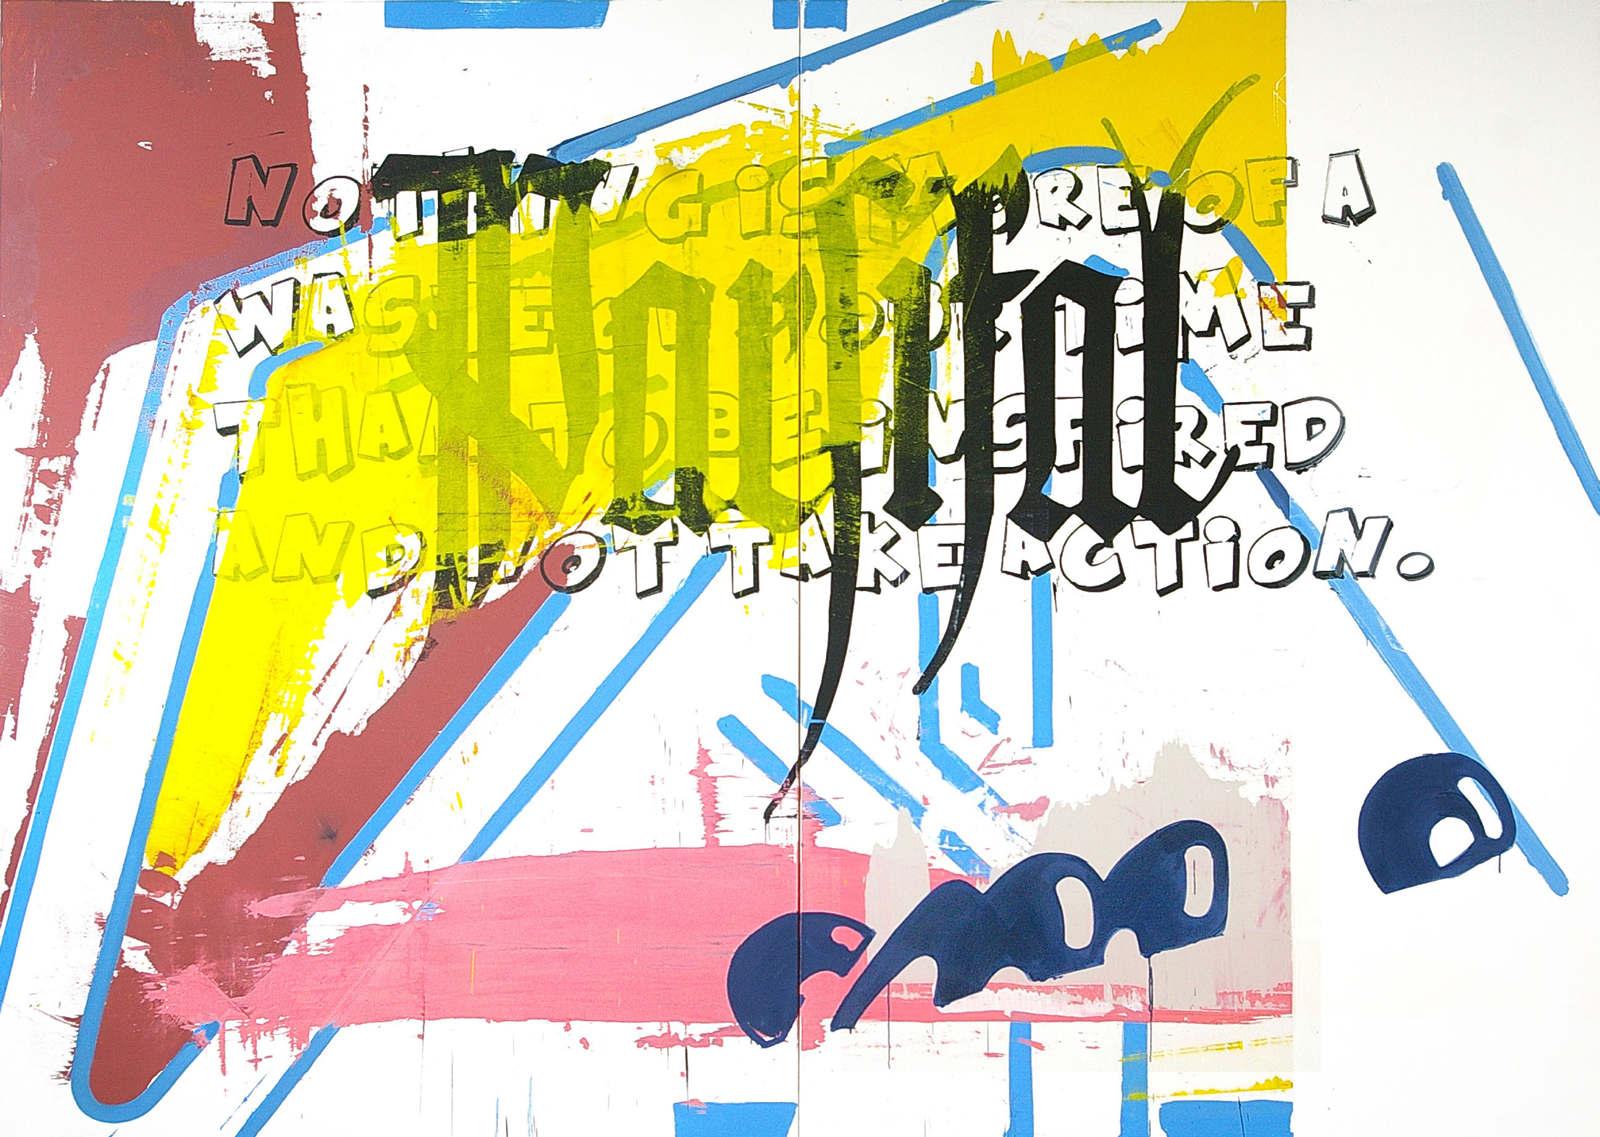 MOTIVATION 285 X 400 Cm, Oil On Canvas, 2015